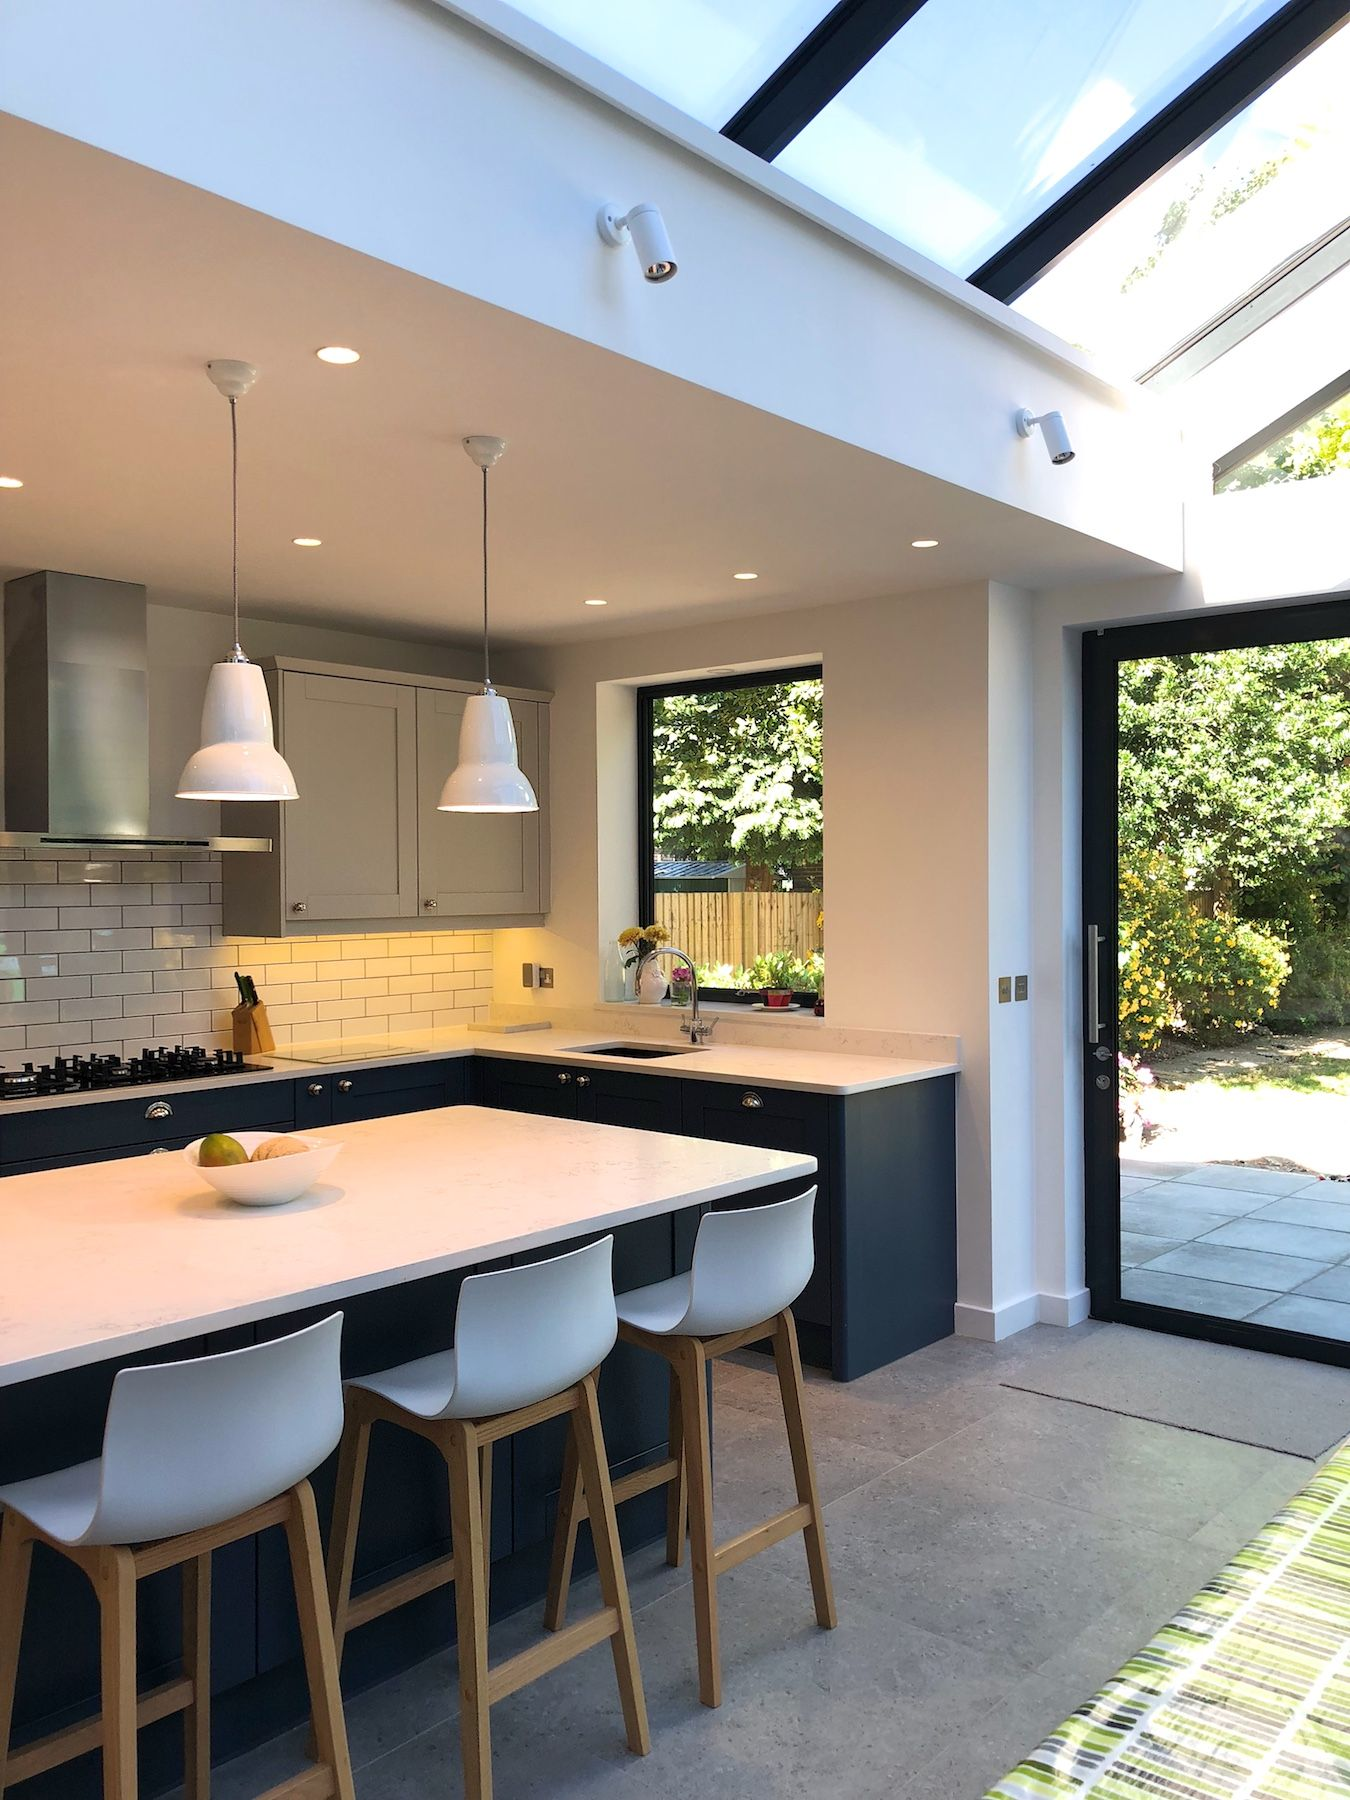 UD2113 — Utopia Kitchens, The Bespoke Kitchen Co.